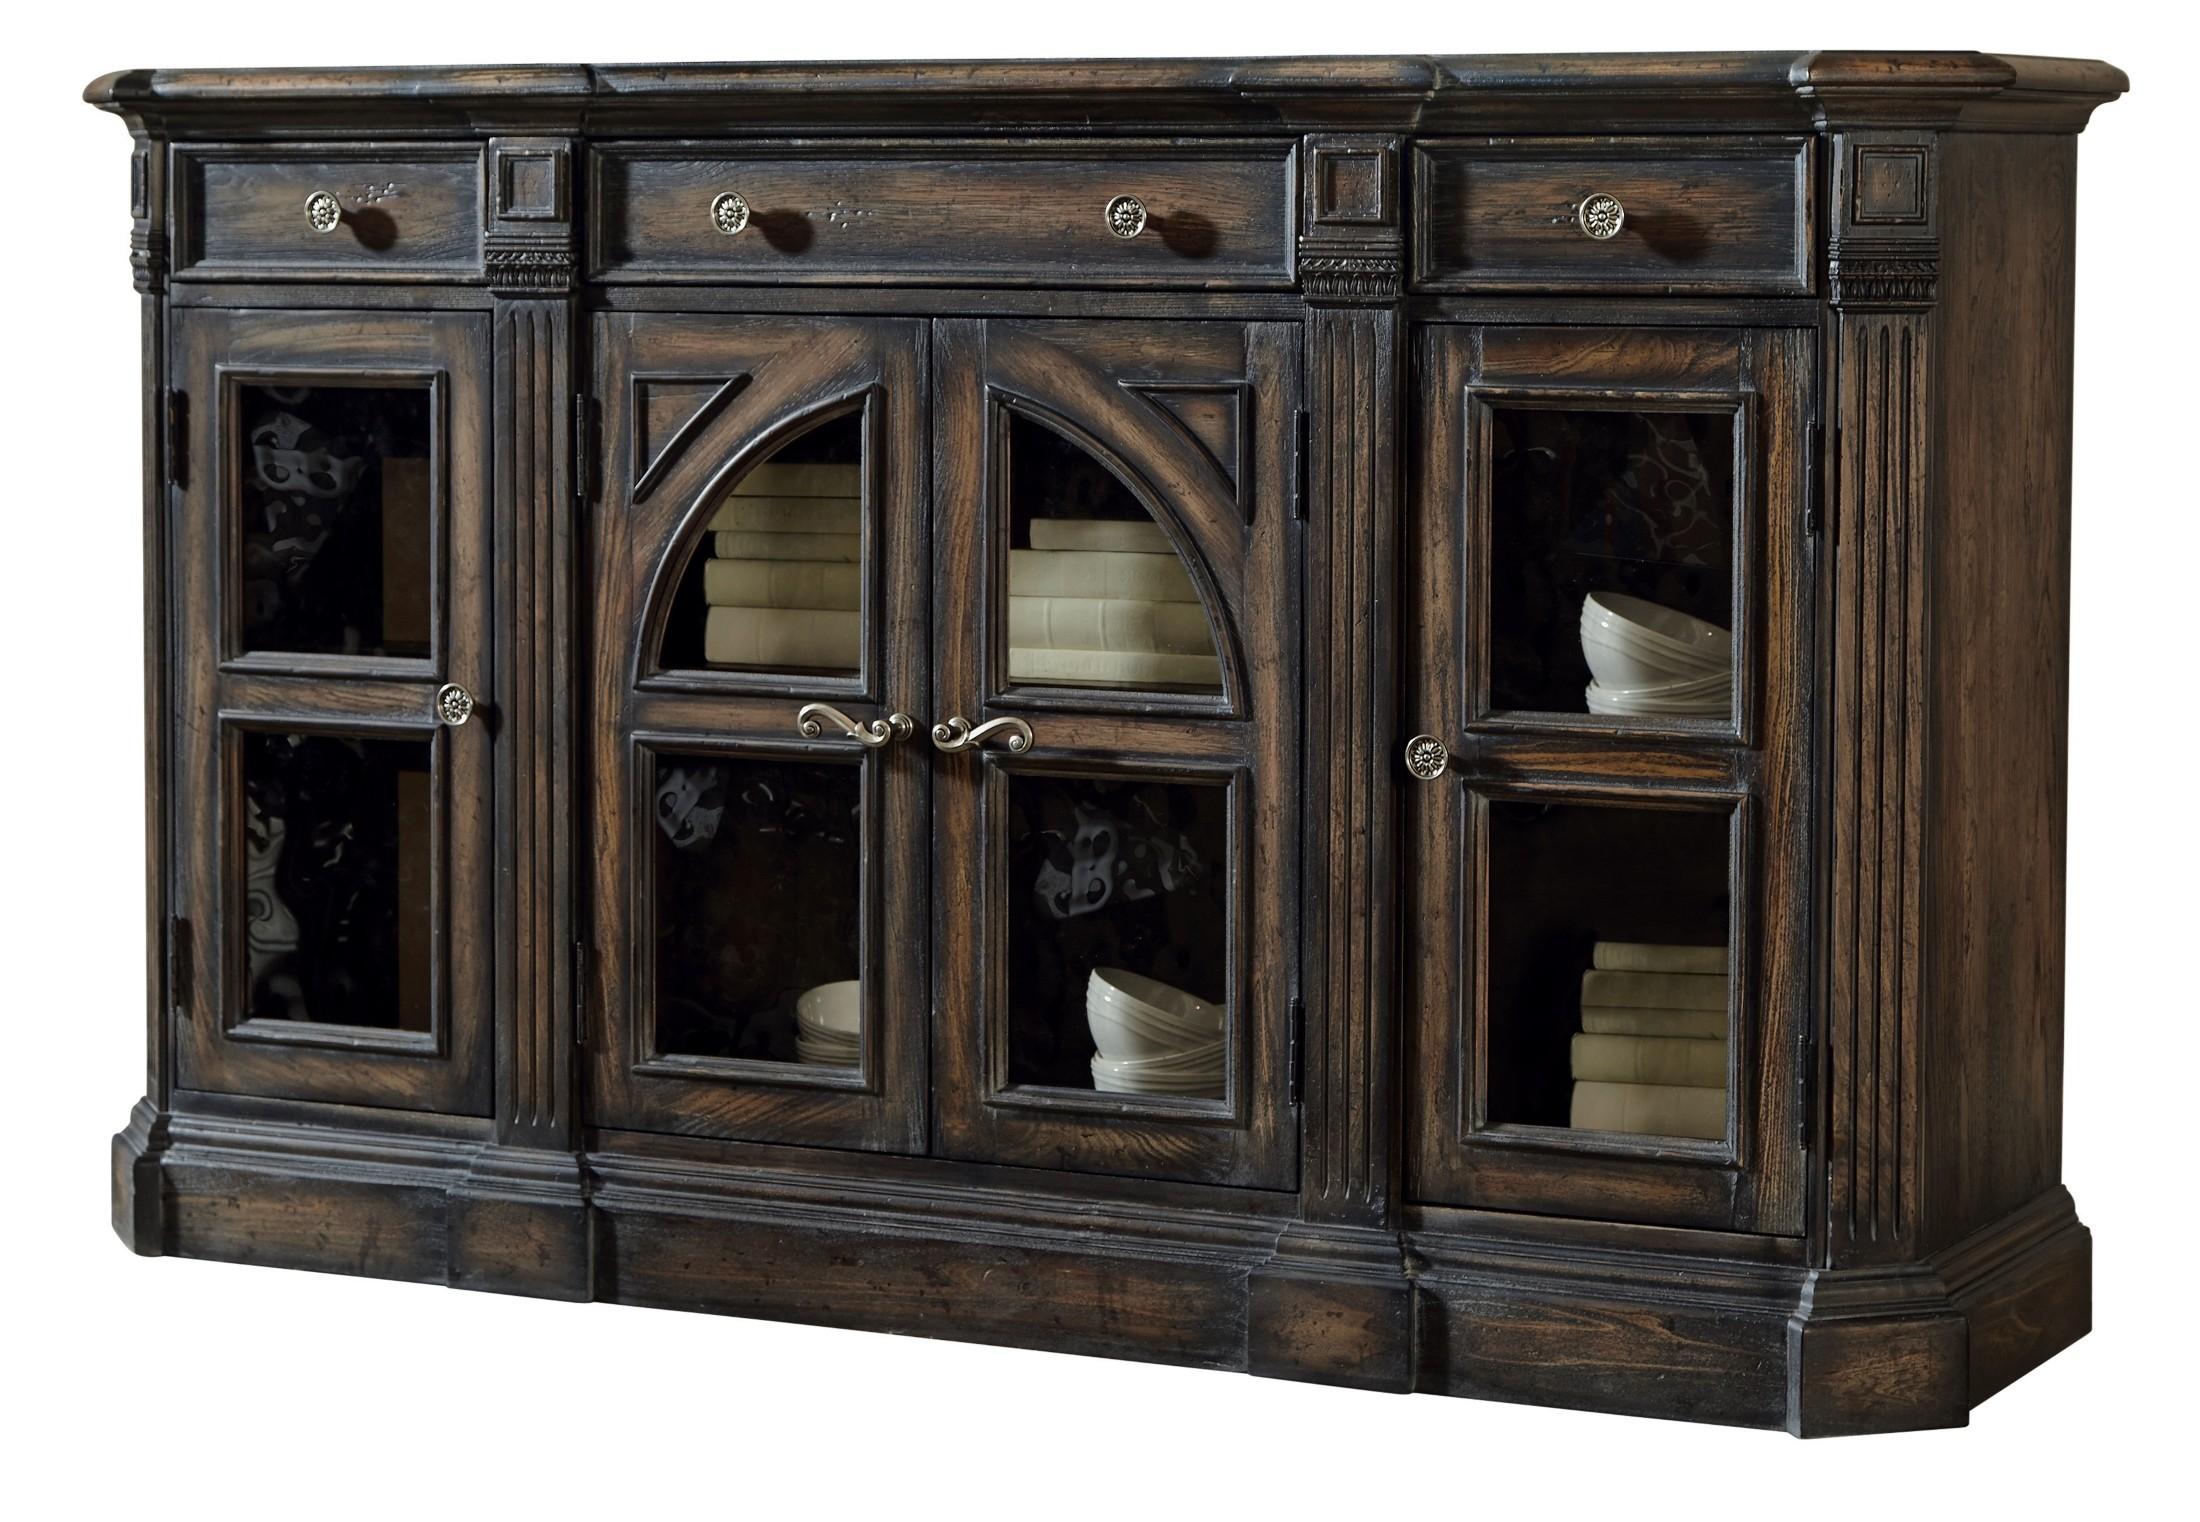 Delmar Sideboard From Pulaski 203009 Coleman Furniture